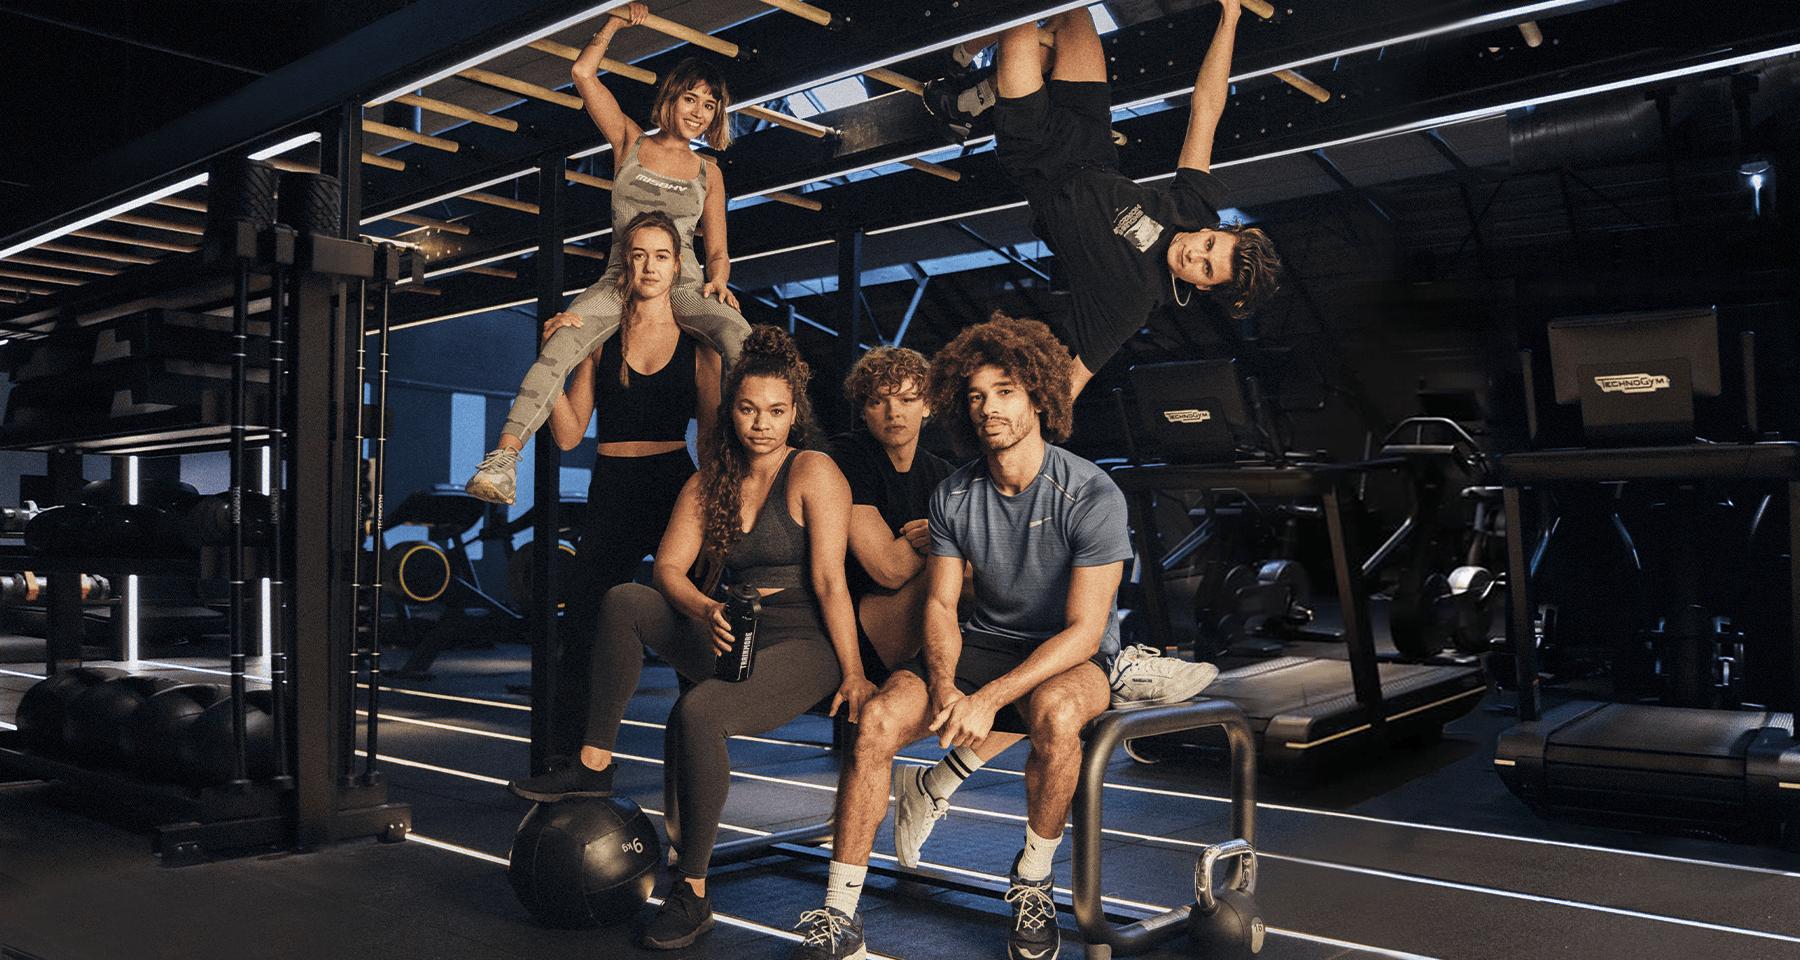 Urban Gym Group